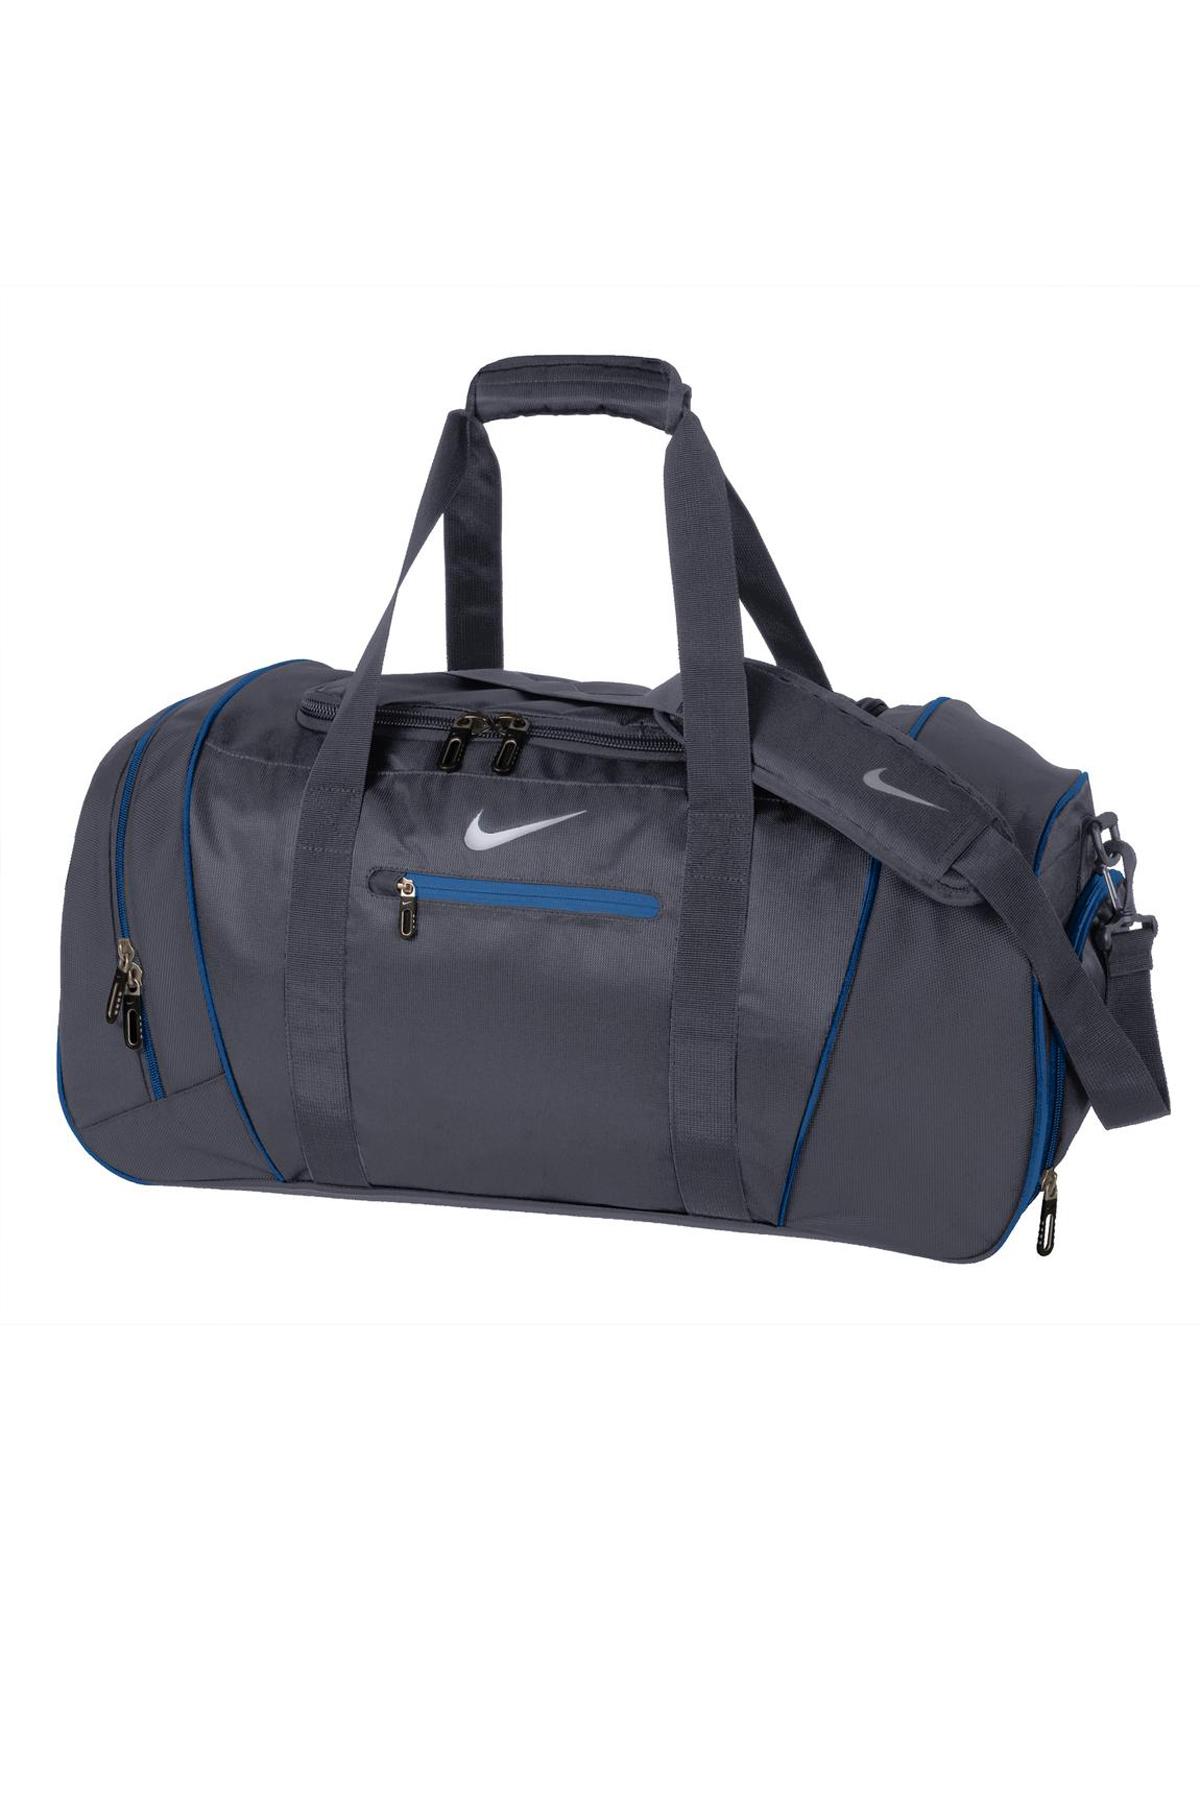 Bags-Duffels-29